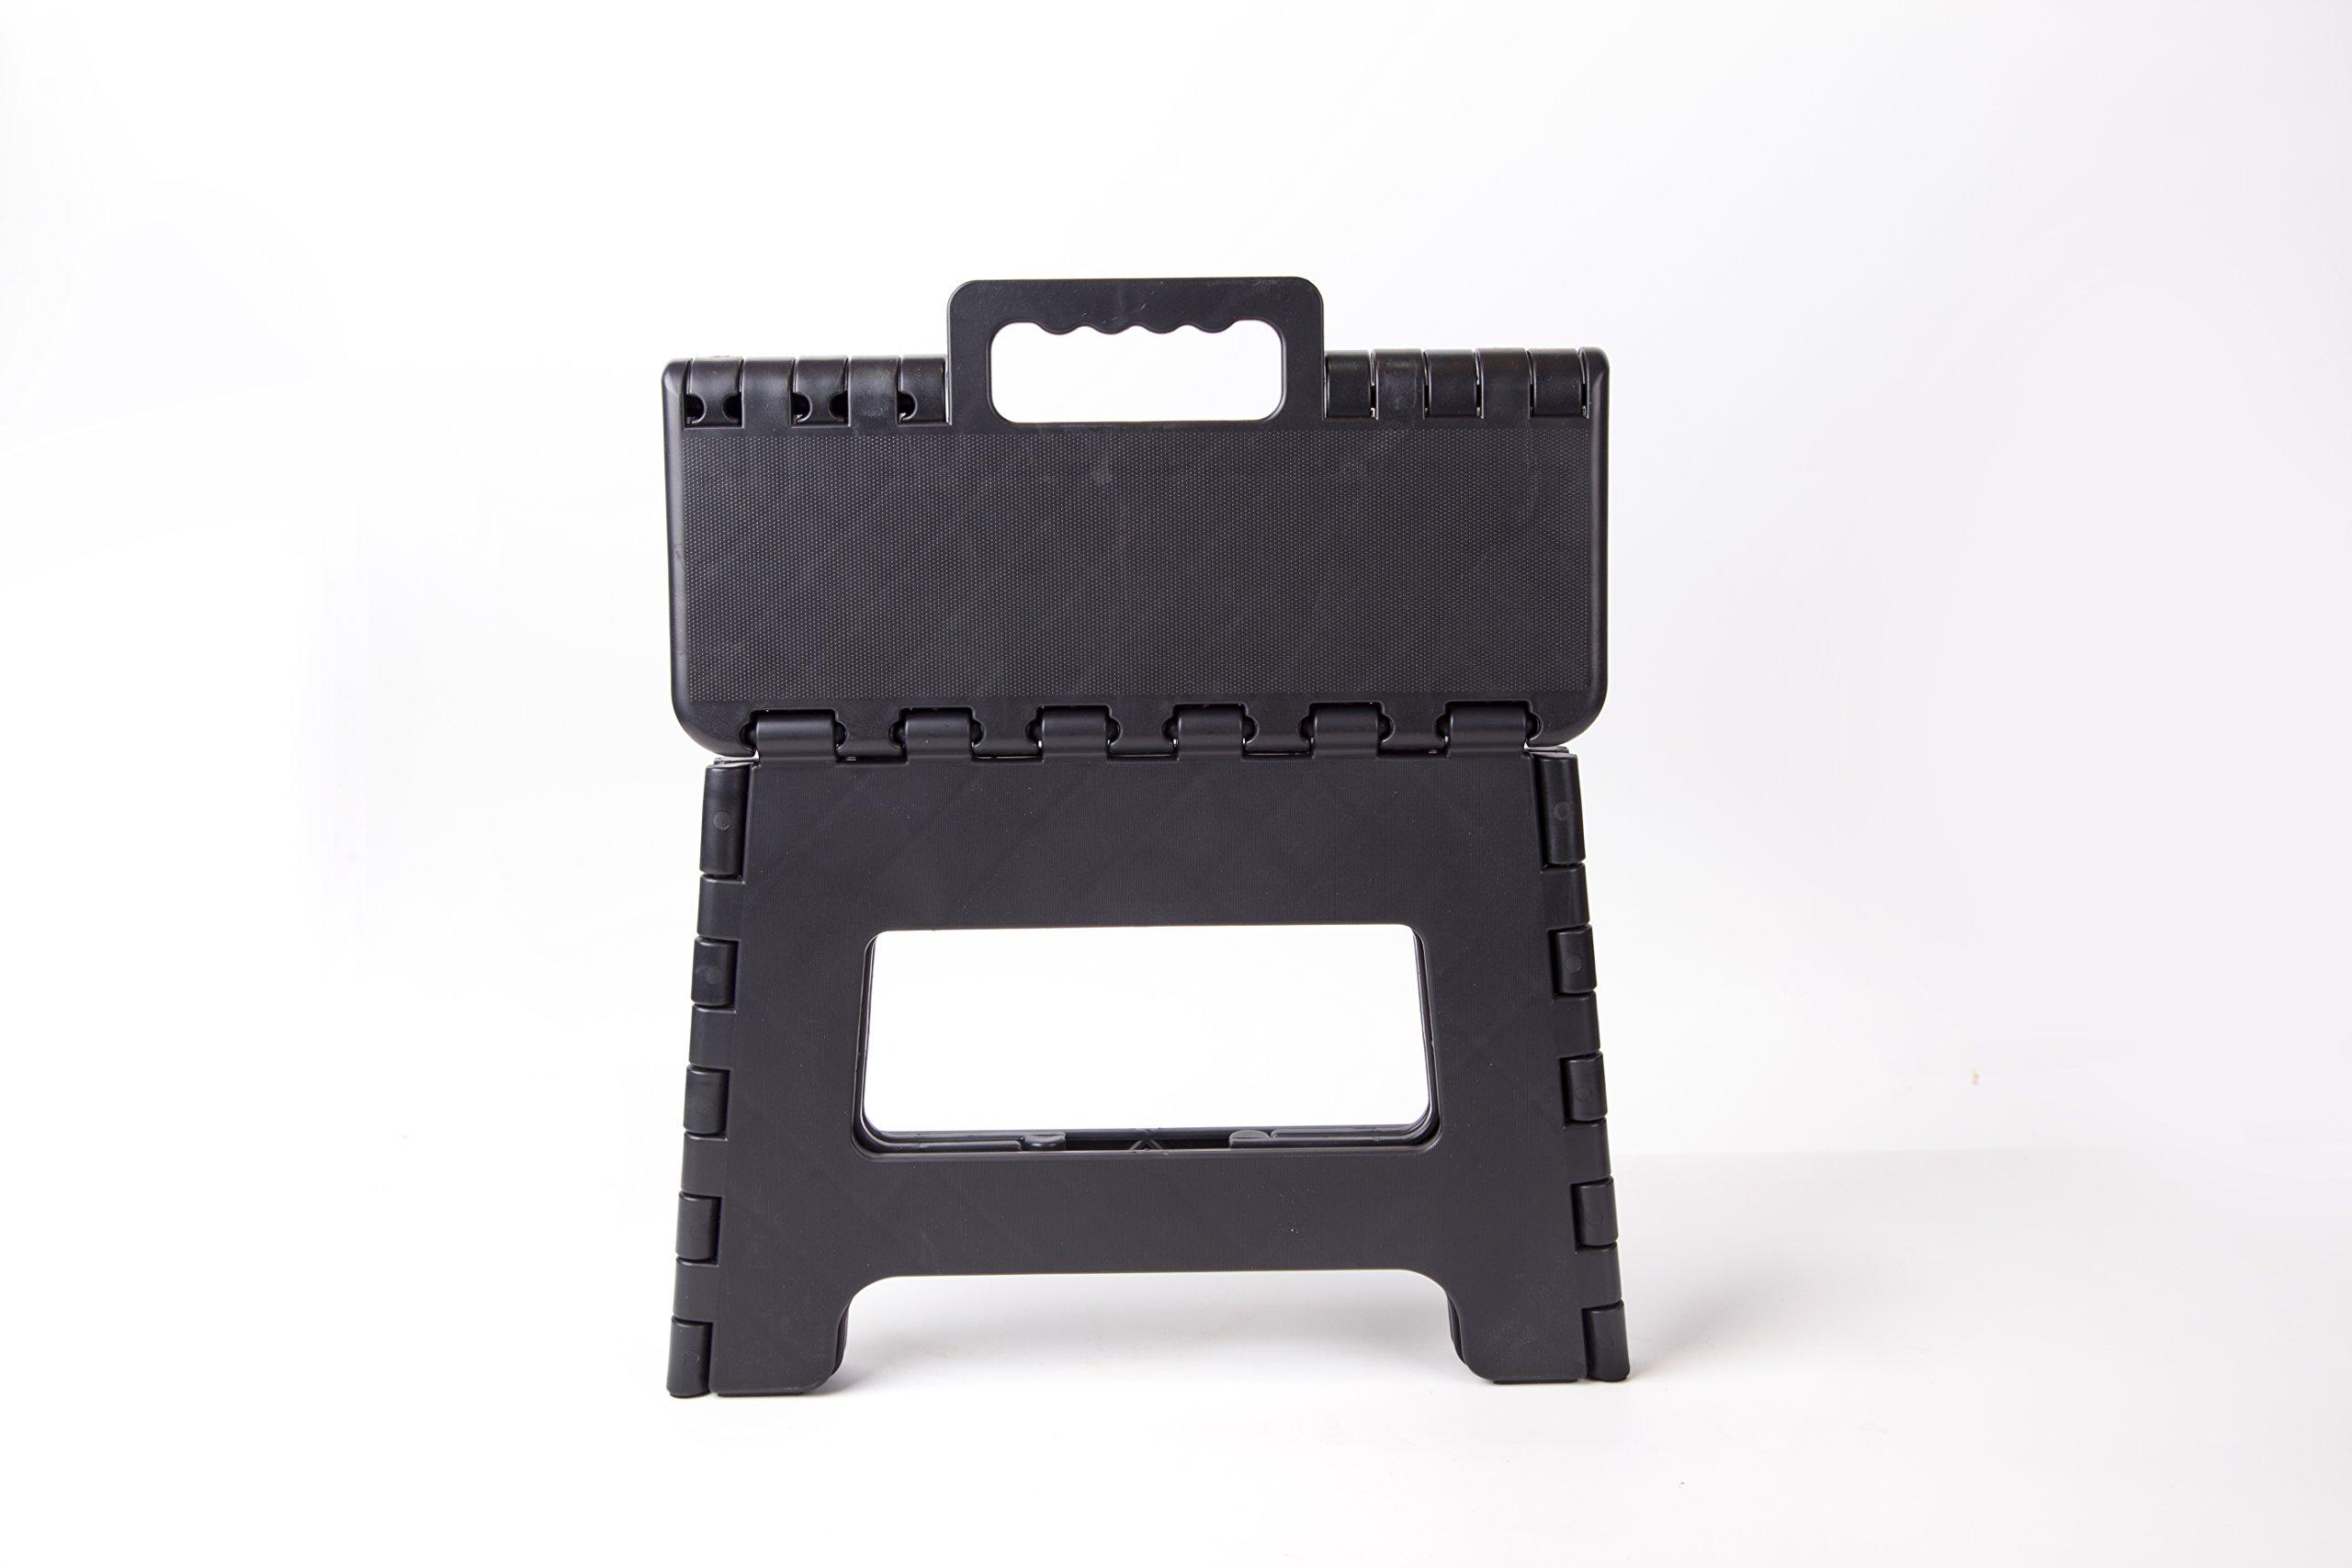 OUMEGO Folding Step Stool, Premium Heavy Duty Foldable Stool For ...